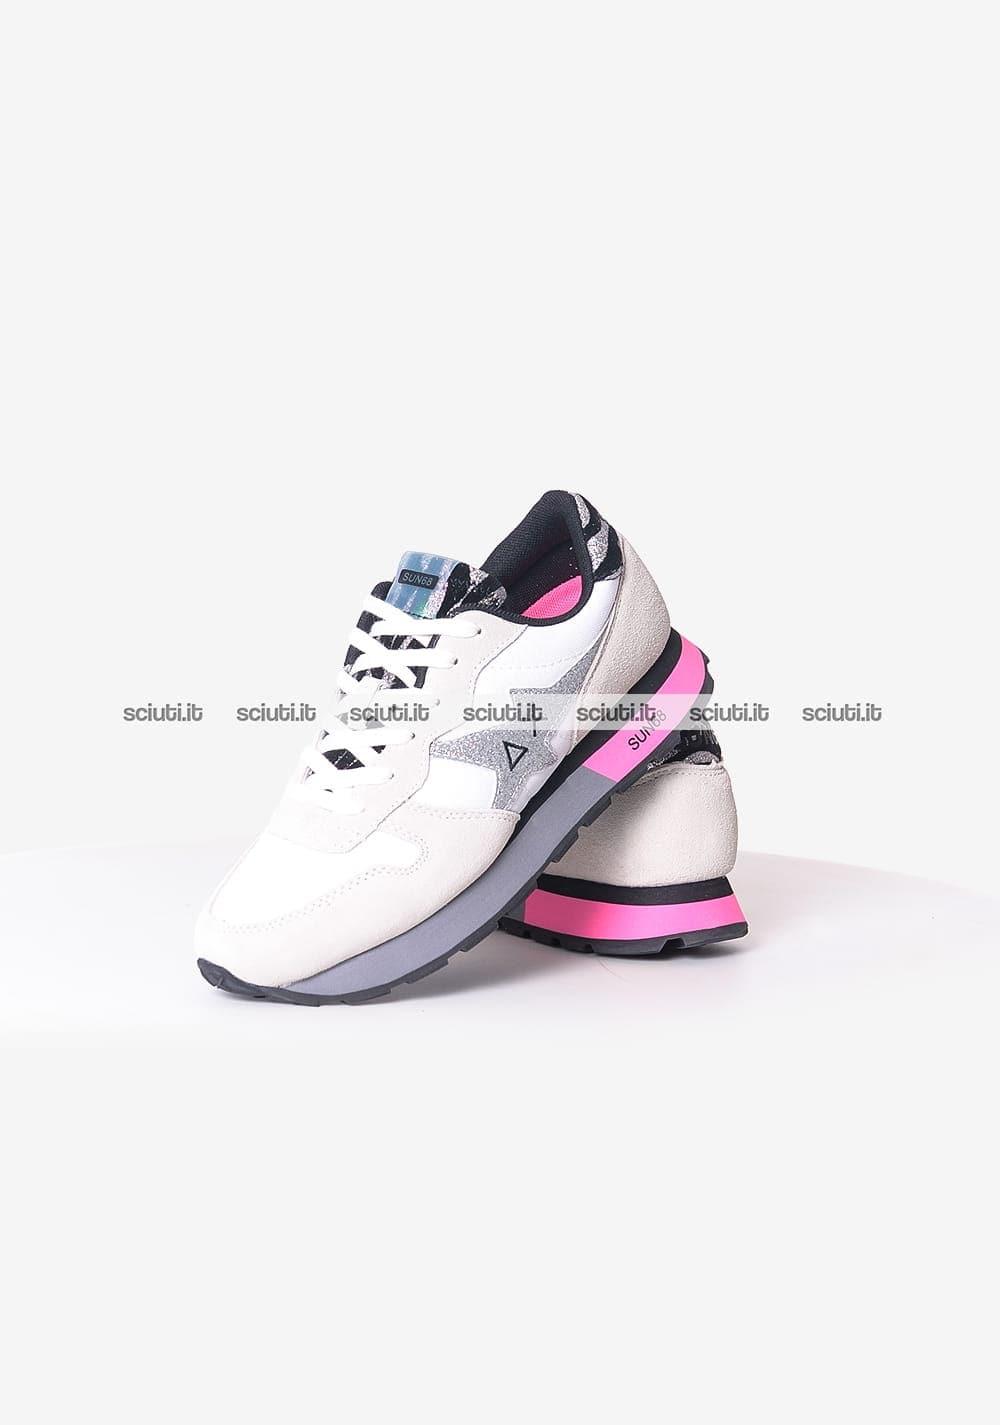 SCARPE SUN68 ALLY STAR GIRL ZEBRA Sneakers Nuove BIA58282 SCARPE FASHION DONNA